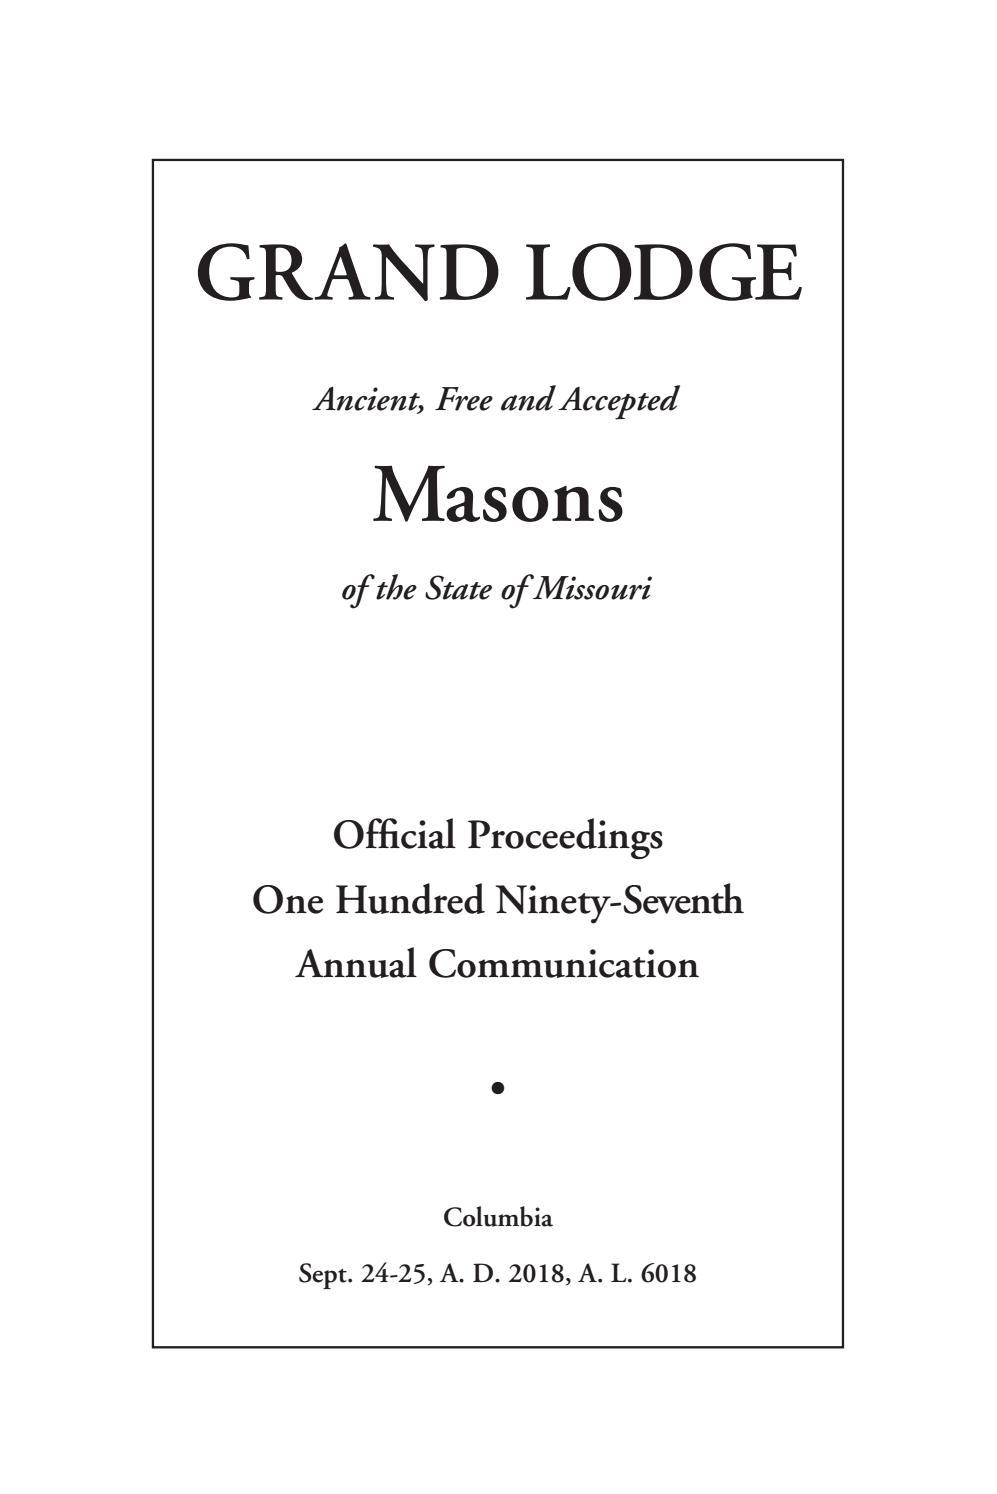 Official Proceedings - Grand Lodge Mo Annual Communication Throughout Las Cruces Public Achools Calendar 2021 20